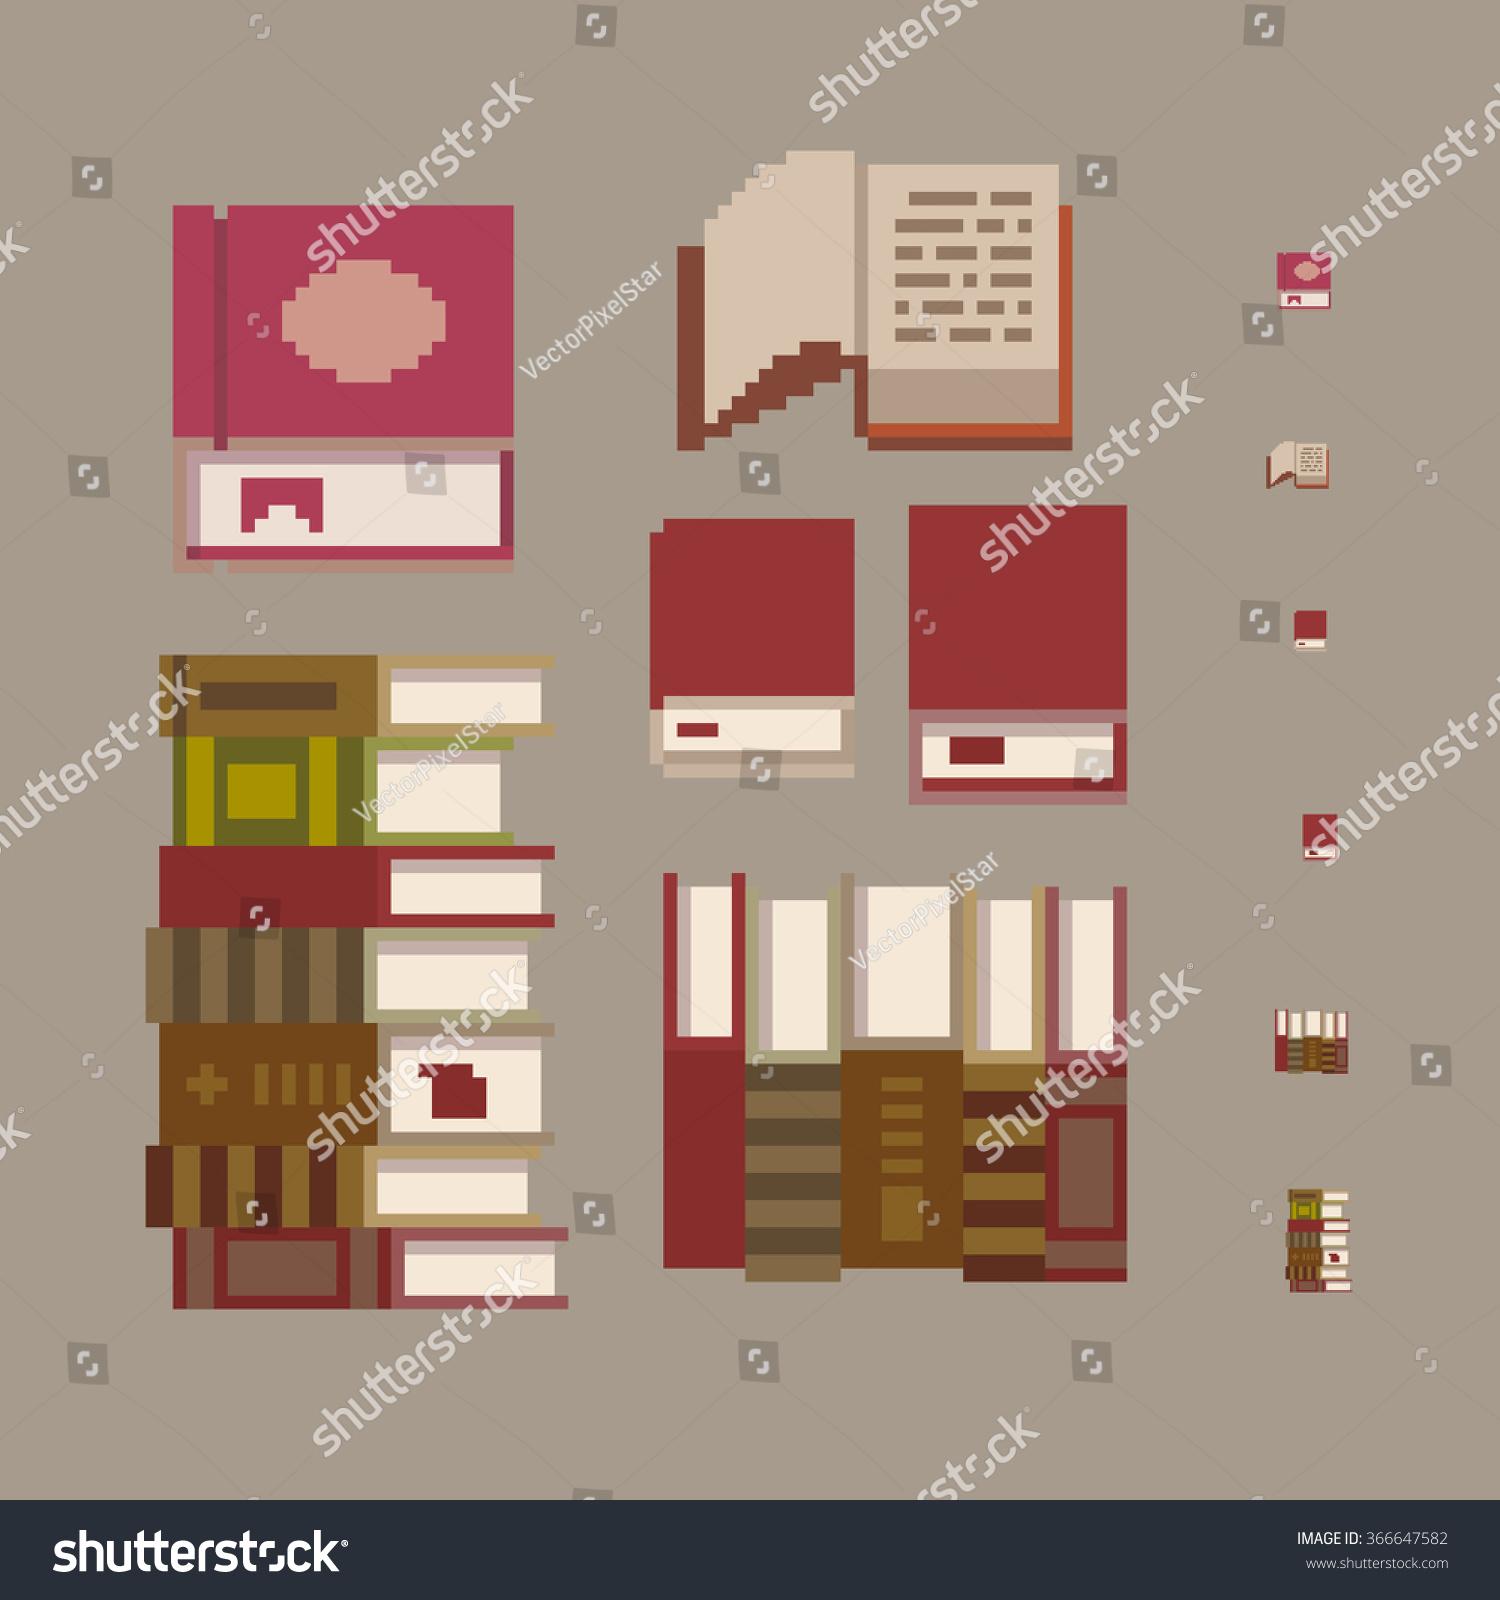 Amazing Pixel Art Book Set Isolated On Grey Background, 8 Bit Game Graphics Style  Vector Illustration